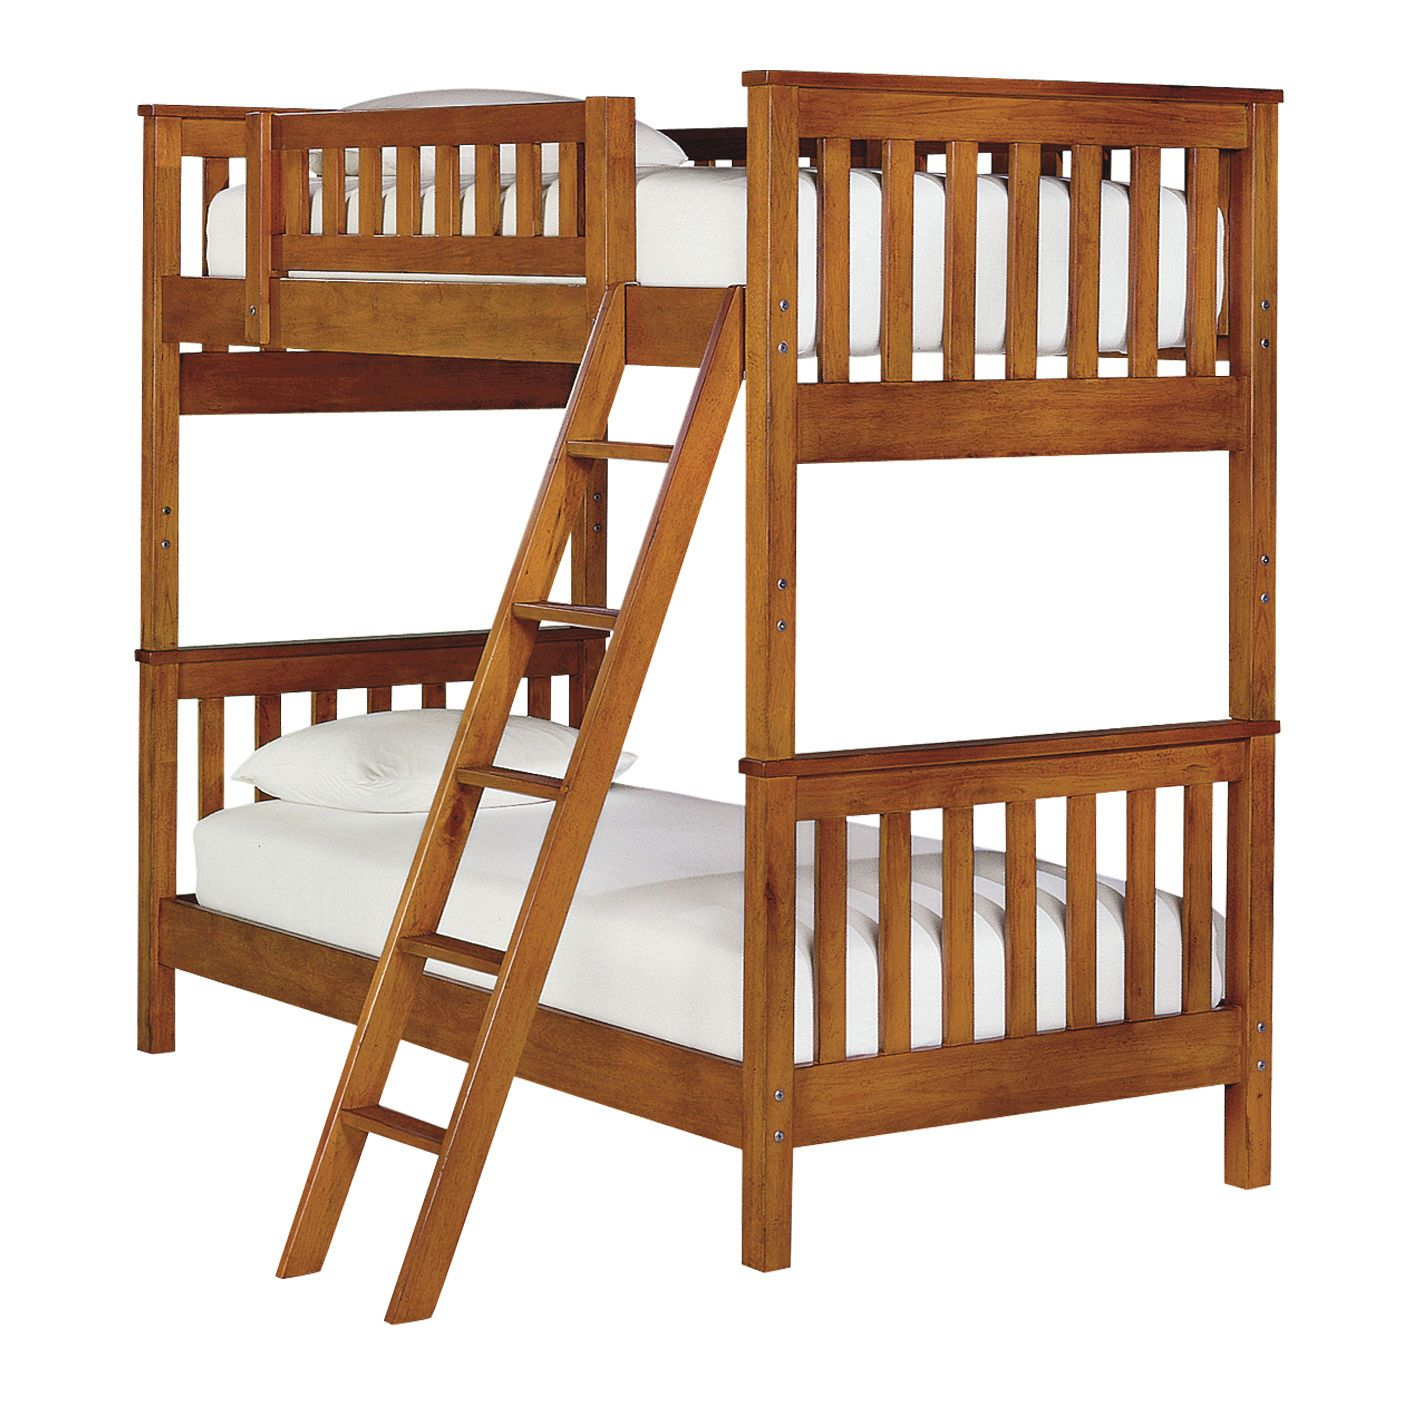 Dylan Bunk Bed Ethan Allen Us Bunk Beds Bed Kid Beds